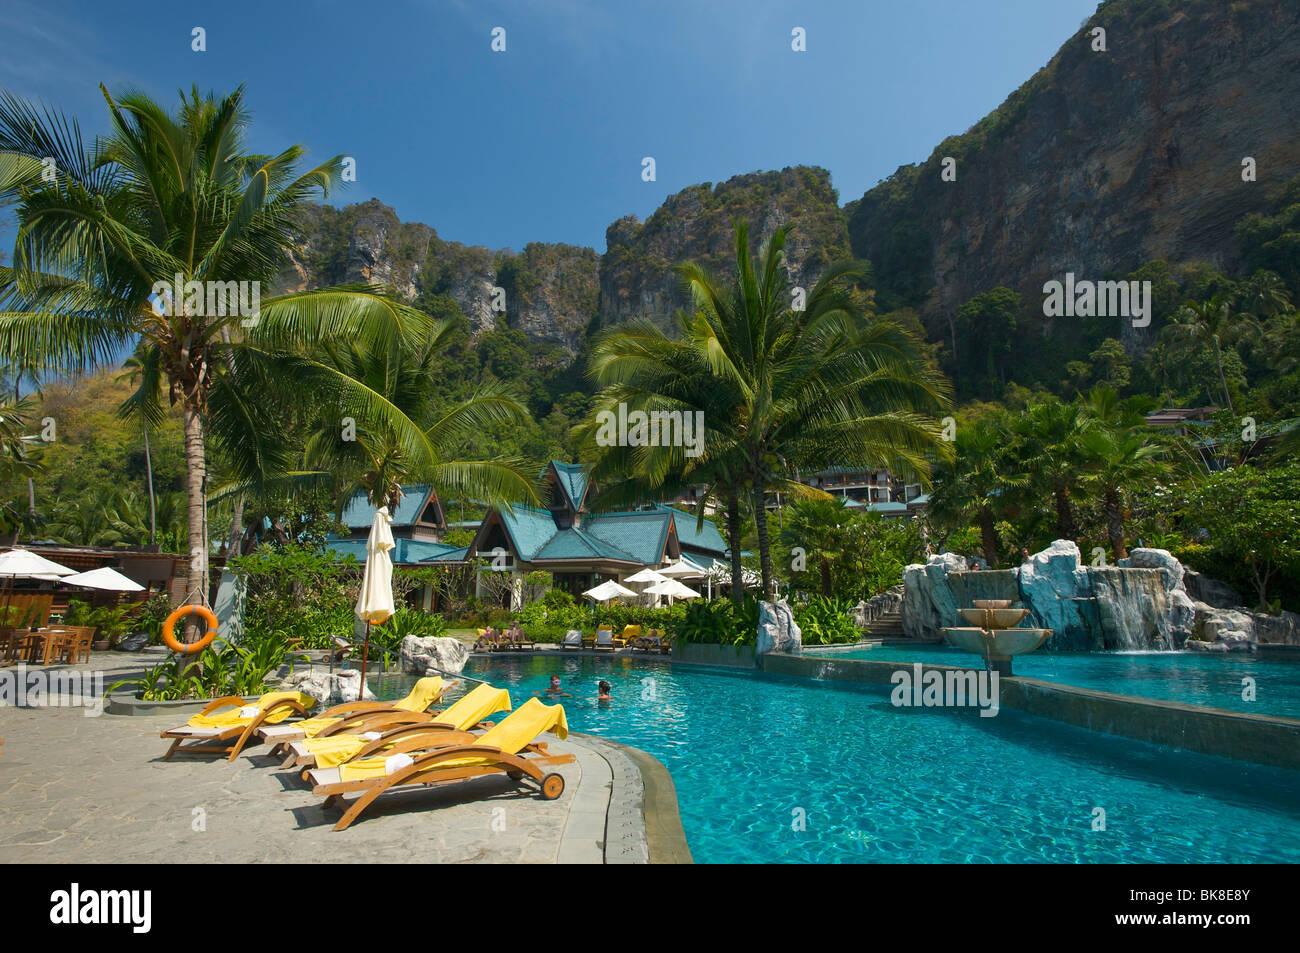 Pool of the Centara Resort, Krabi, Thailand, Asia - Stock Image